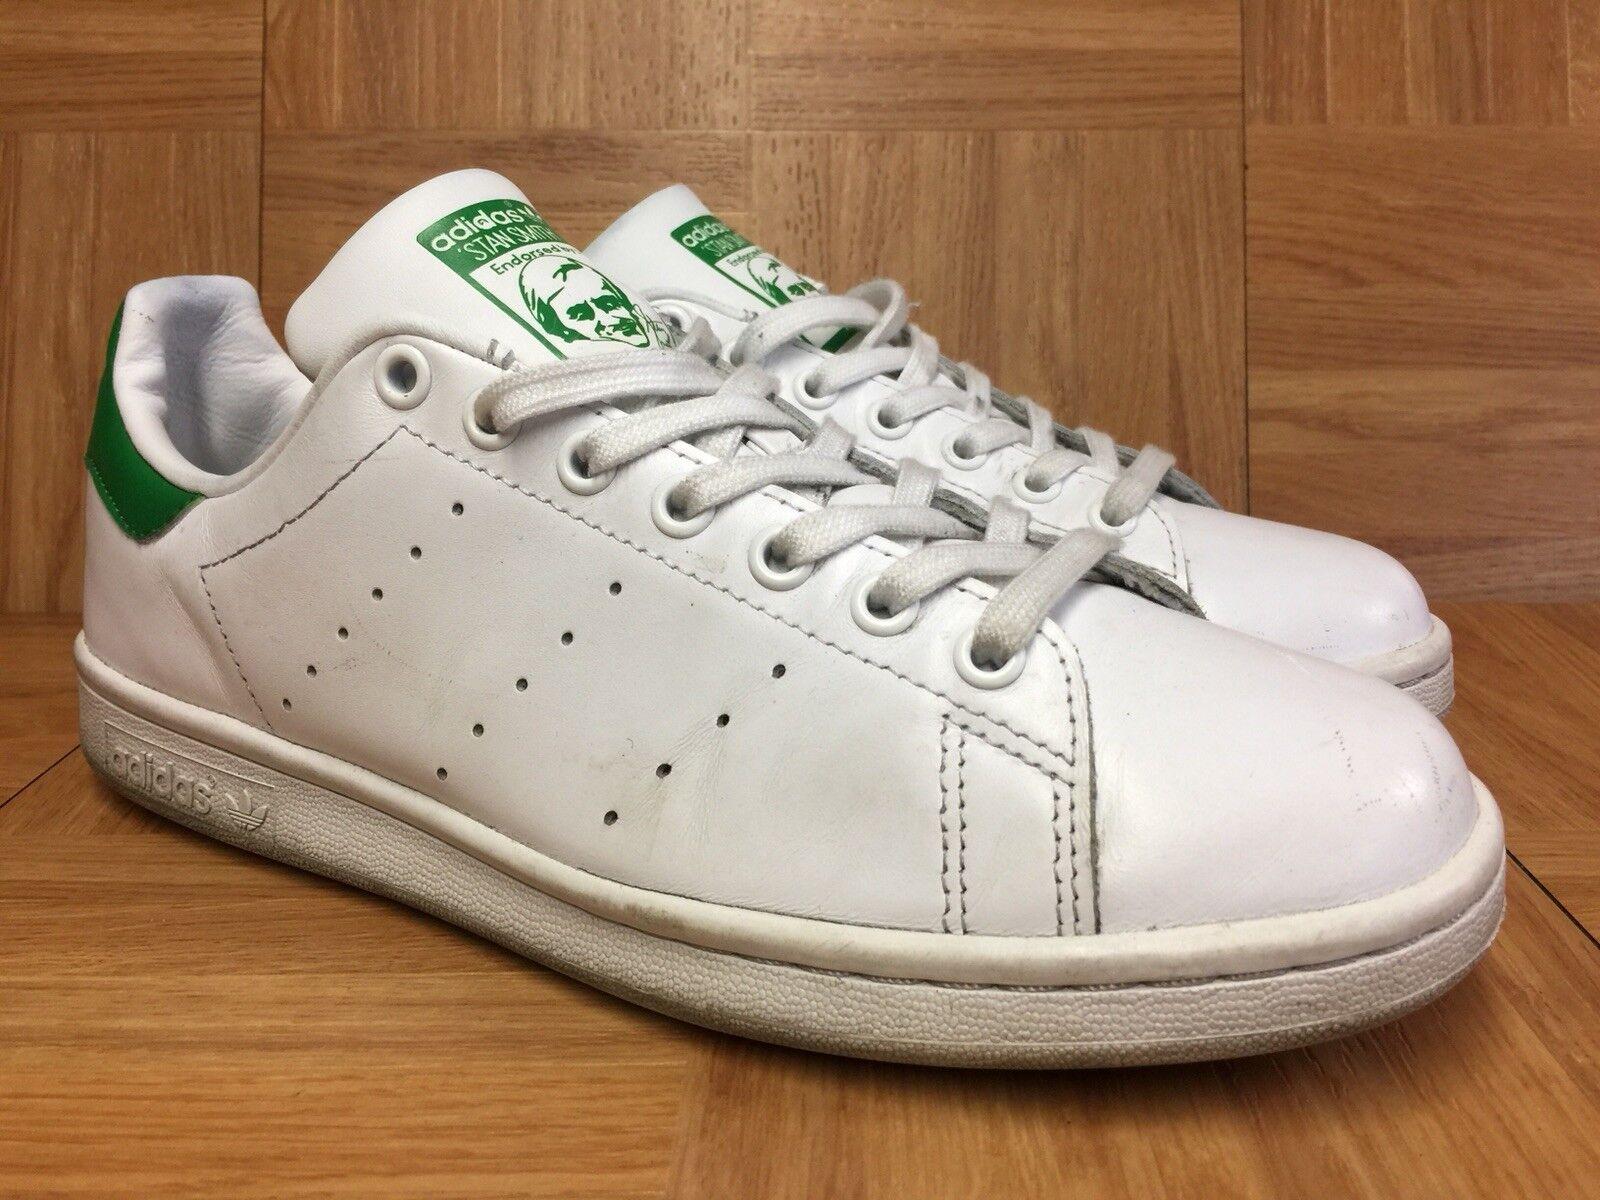 Cloud Smith Stan Adidas RARE White M20324 8.5 Sz shoes